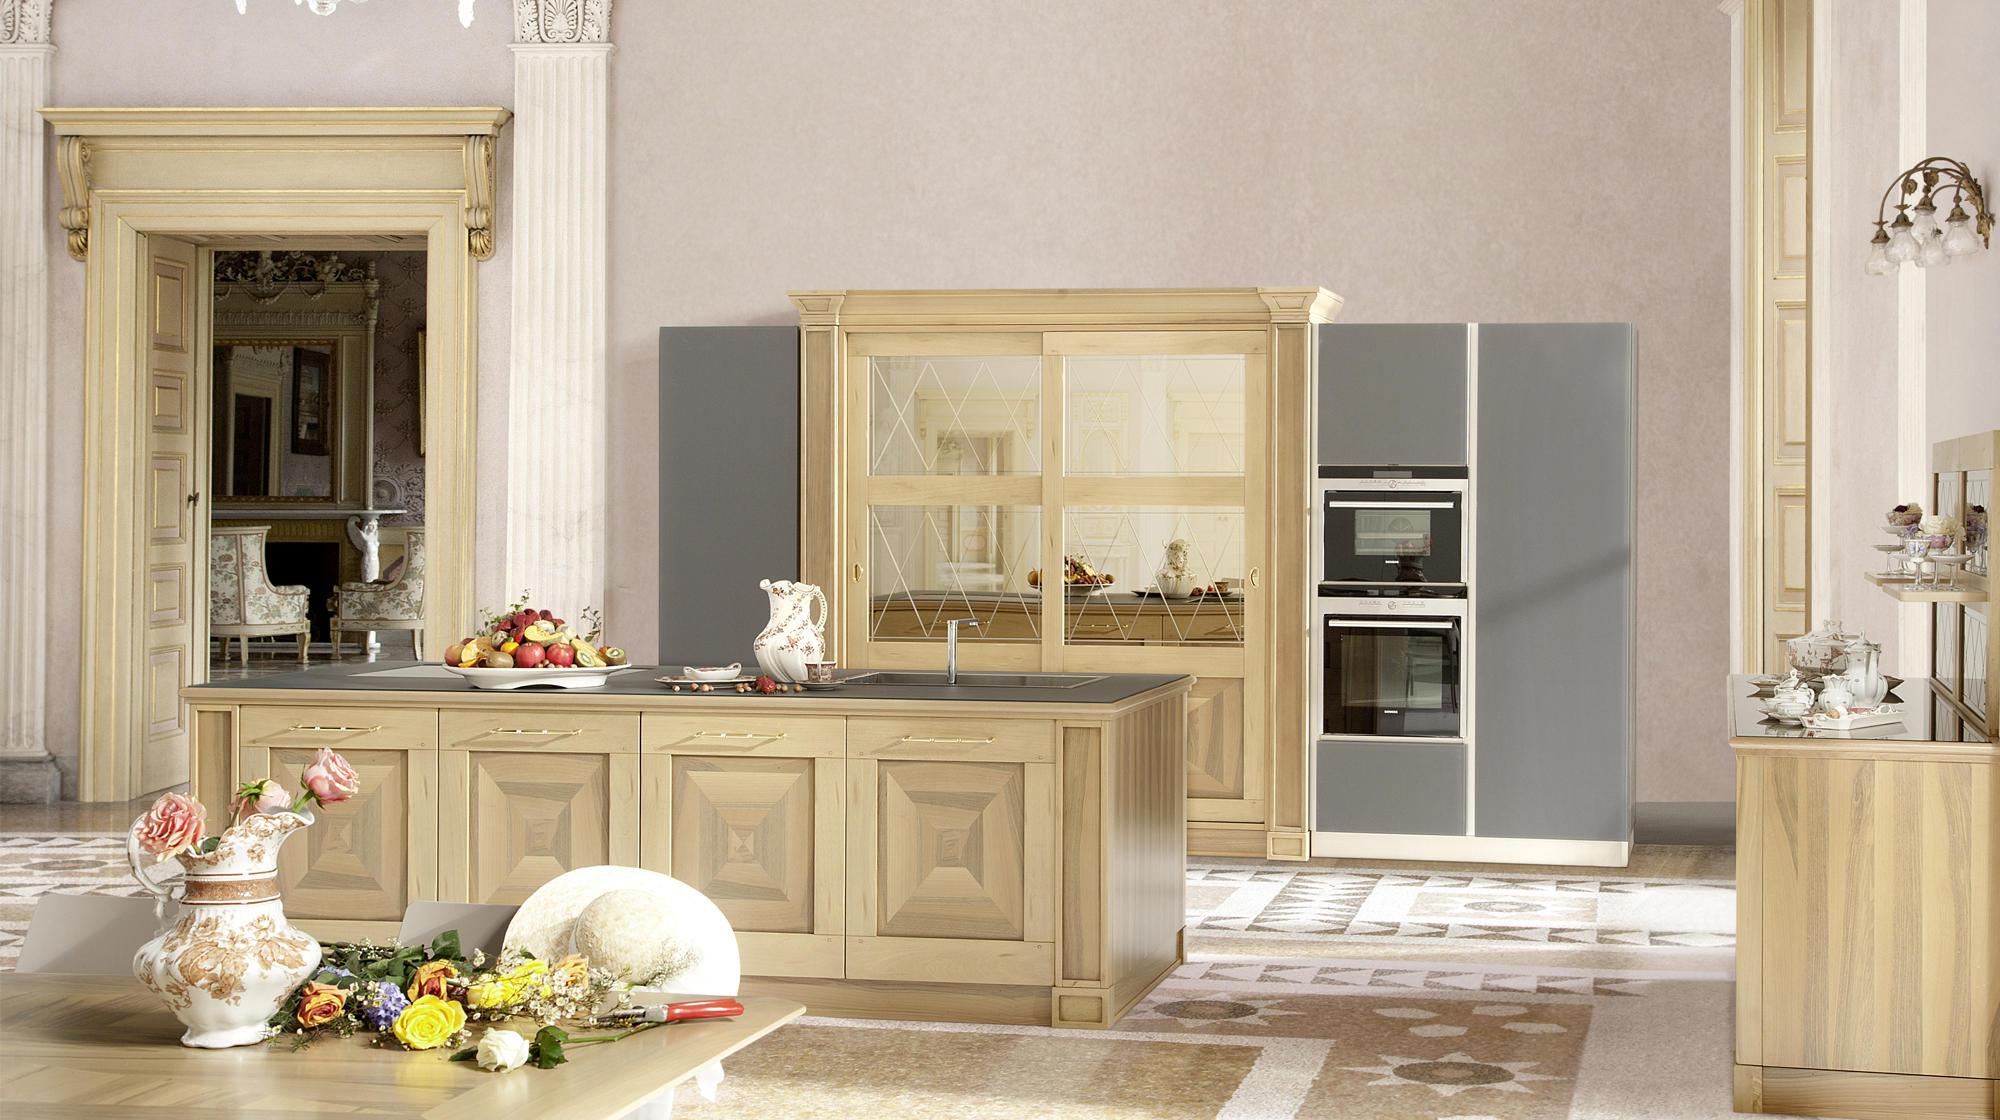 Ca' Veneta Cocinas Integrales De Veneta Cucine Architonic #B4AC17 2000 1120 Veneta Cucine Ca D'oro